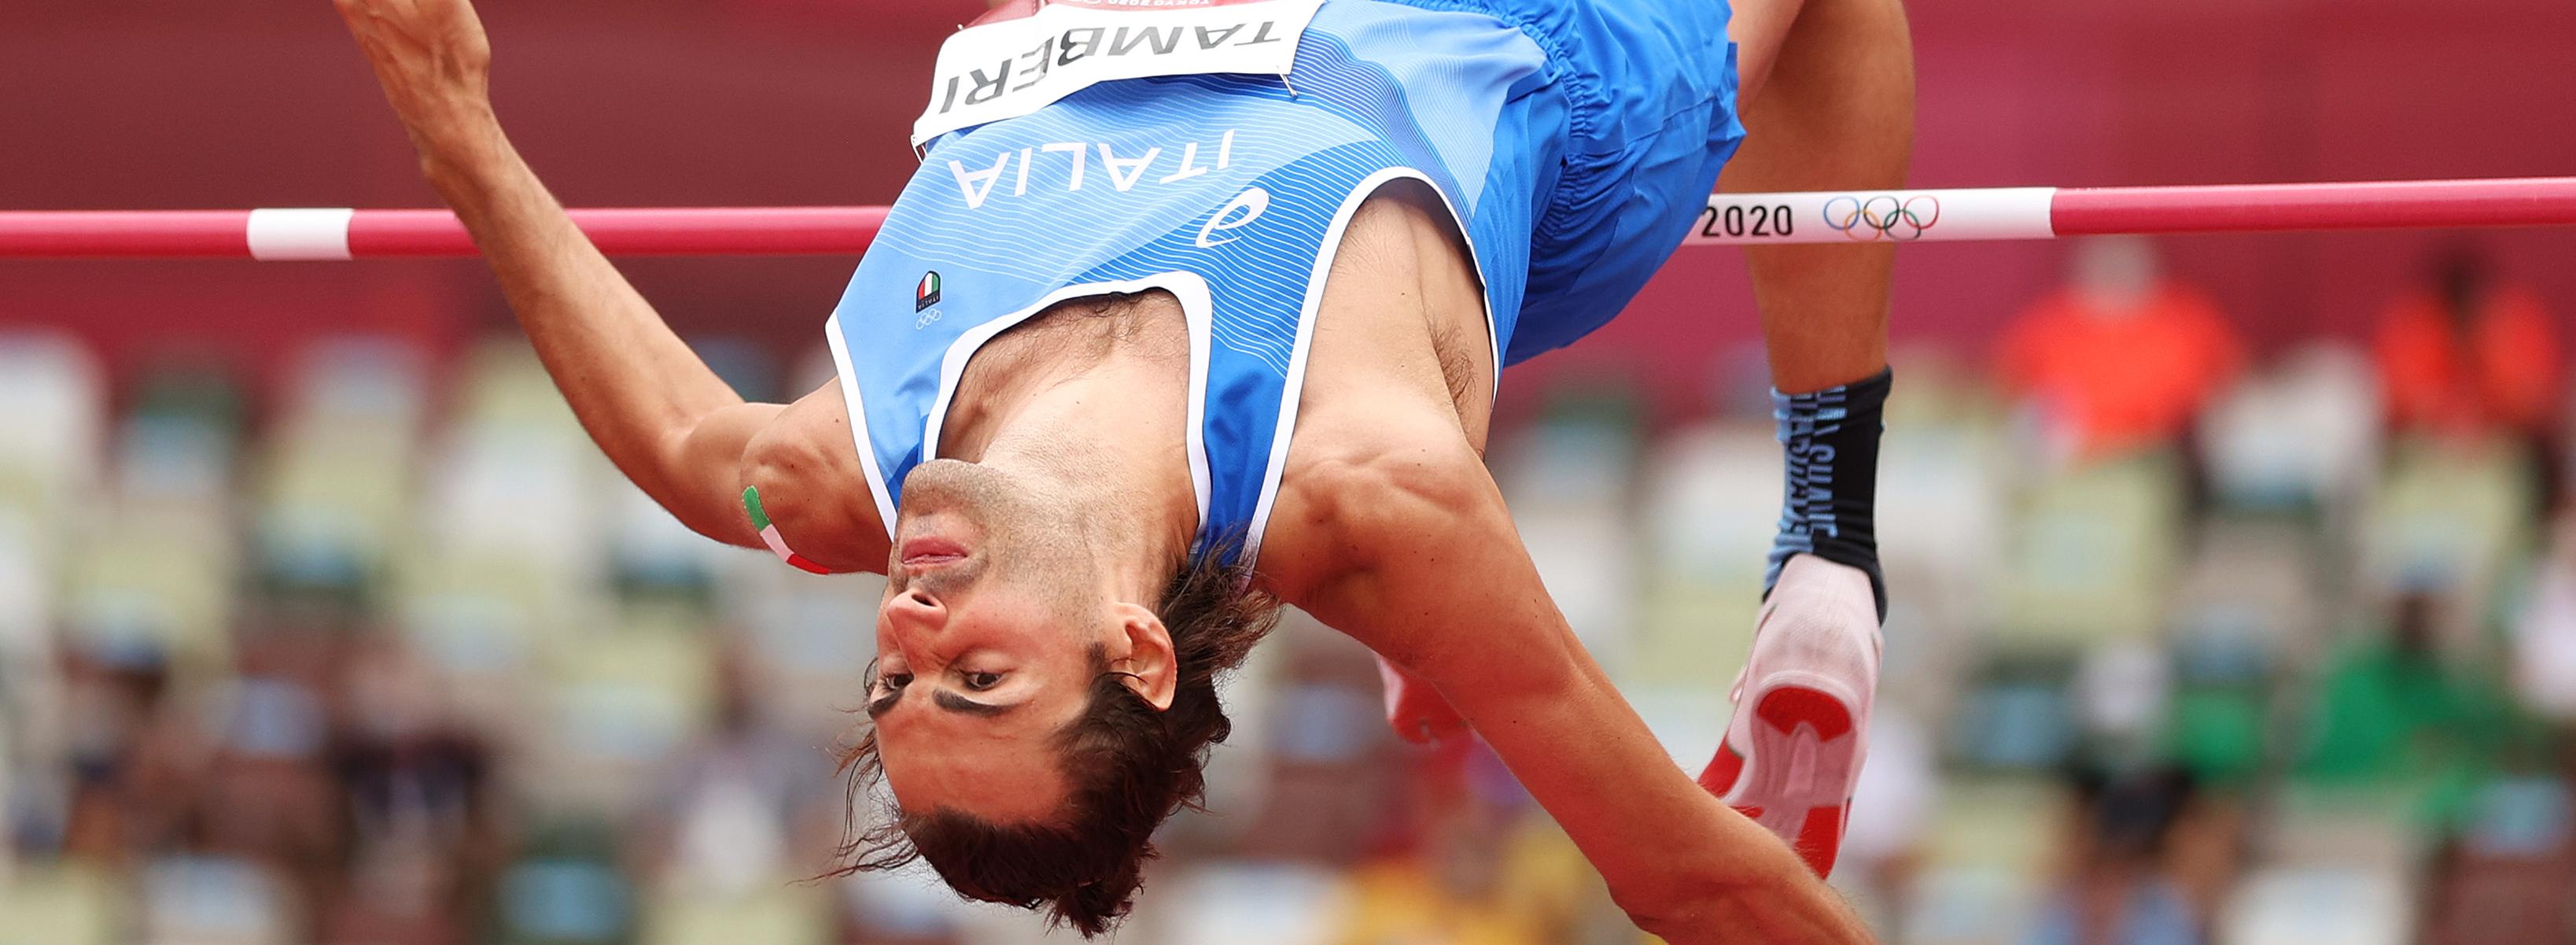 Gianmarco Tamberi - quote finale salto in alto Olimpiadi Tokyo